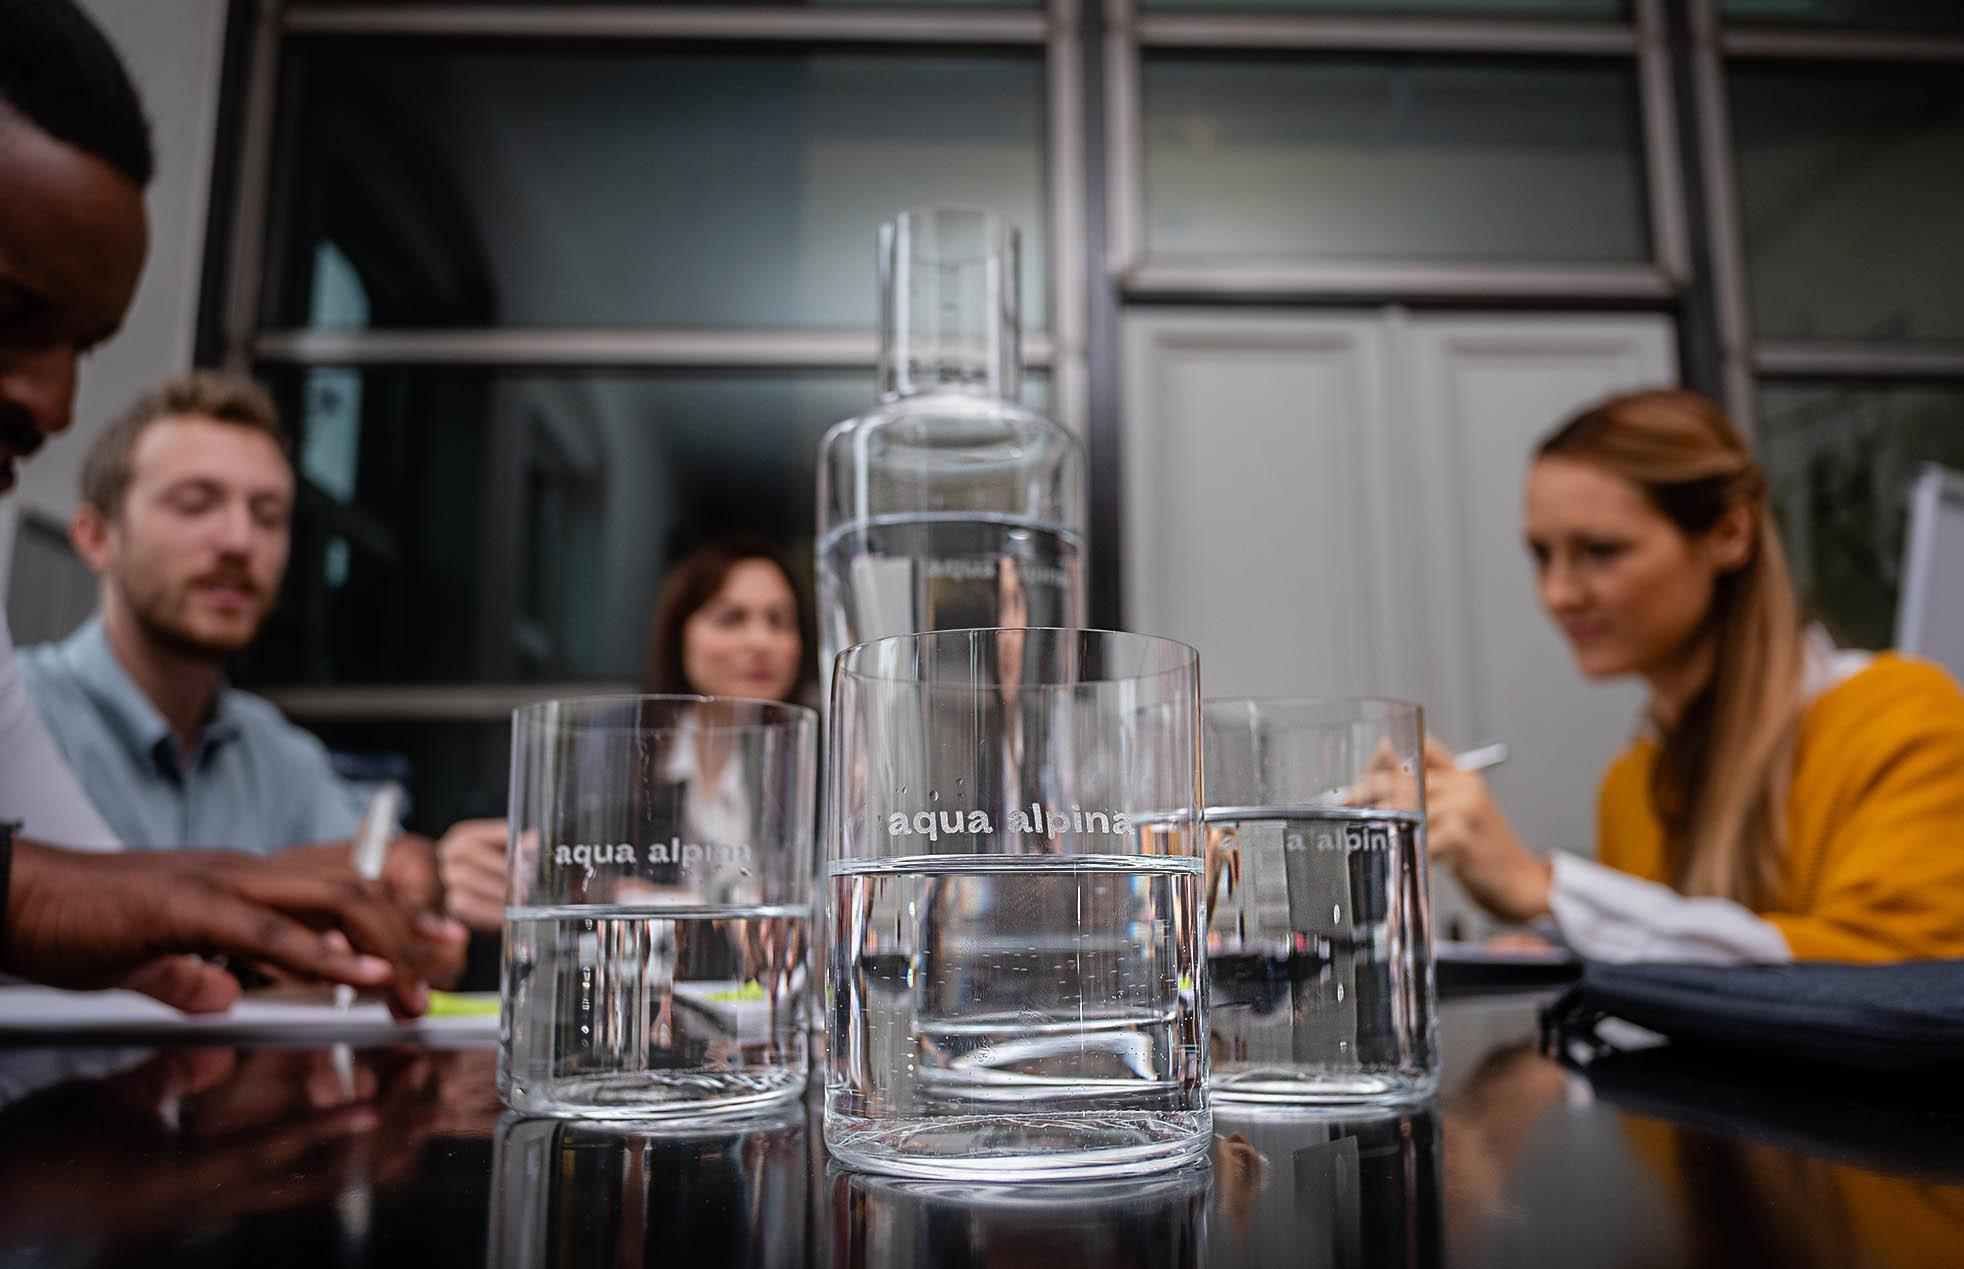 aqua alpina Glas am Arbeitsplatz